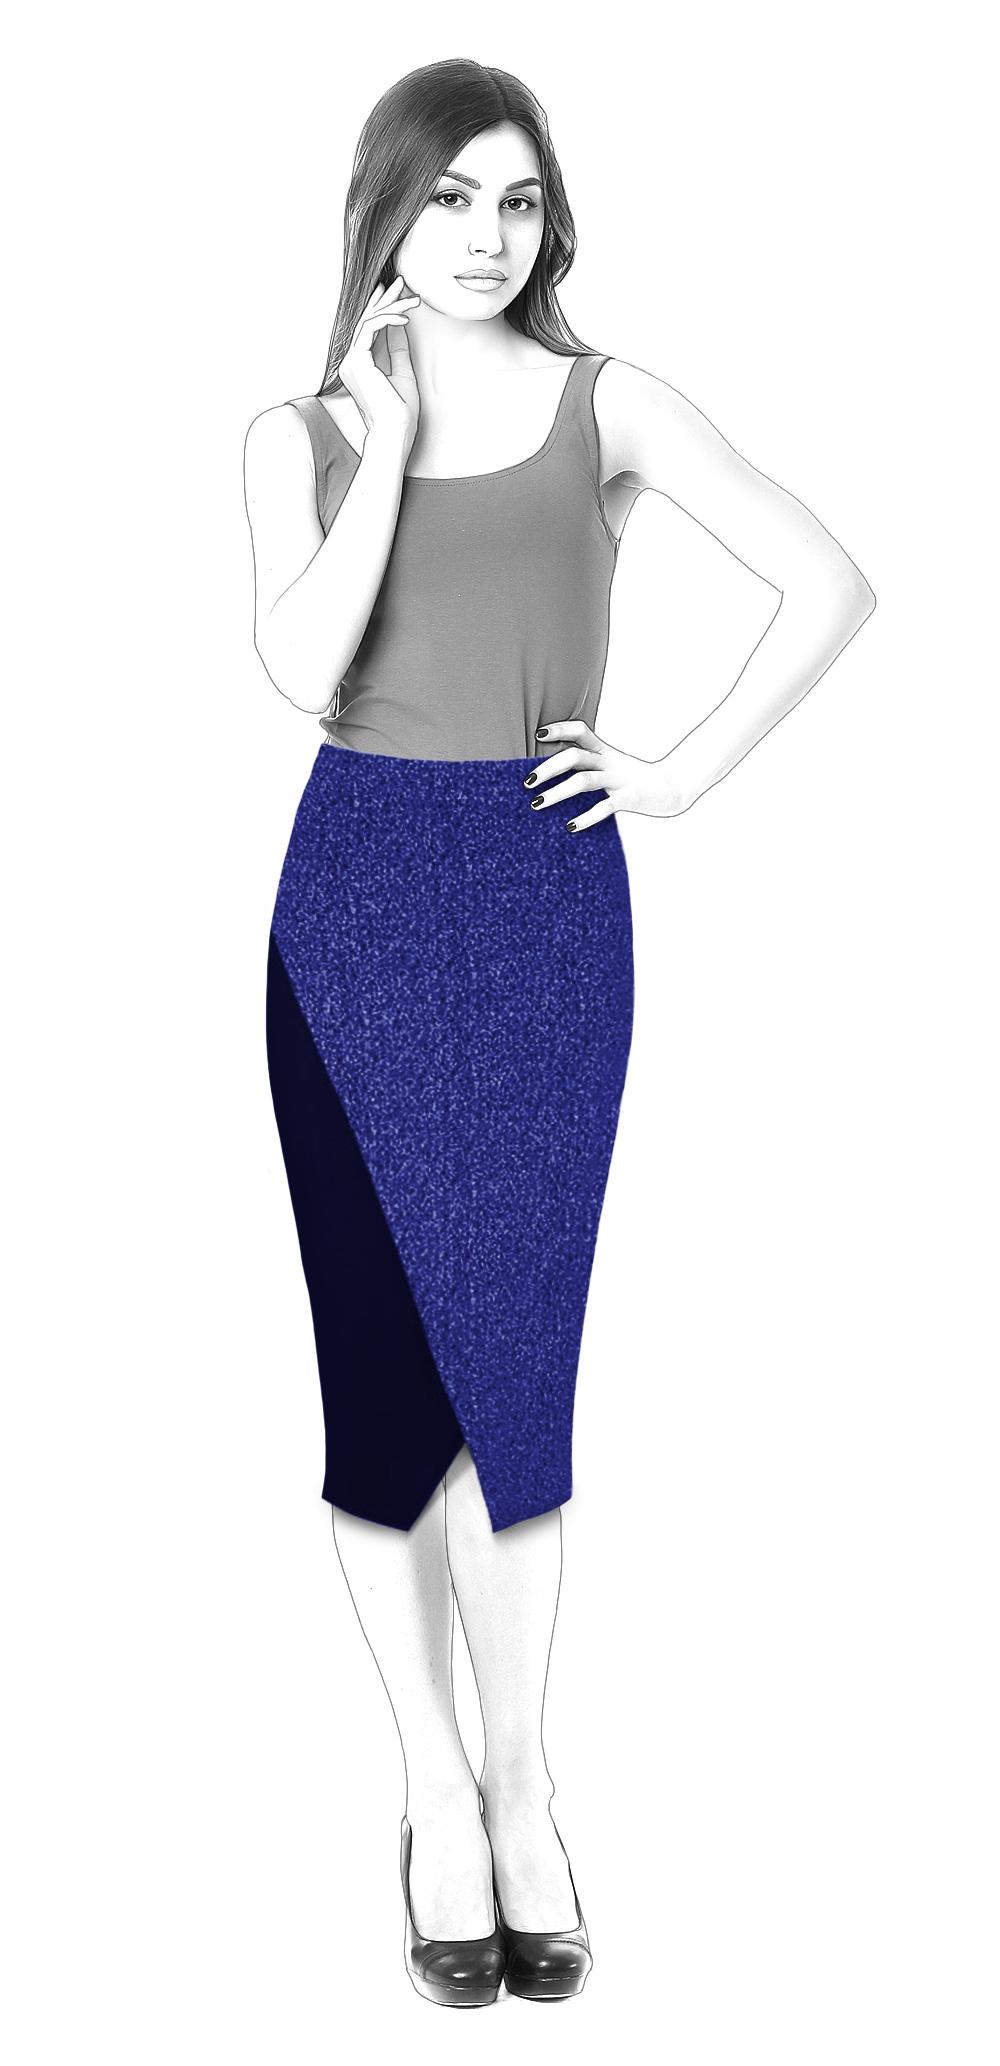 Pencil skirt with wrap sewing pattern s3028 made to measure pencil skirt with wrap sewing pattern s3028 jeuxipadfo Choice Image